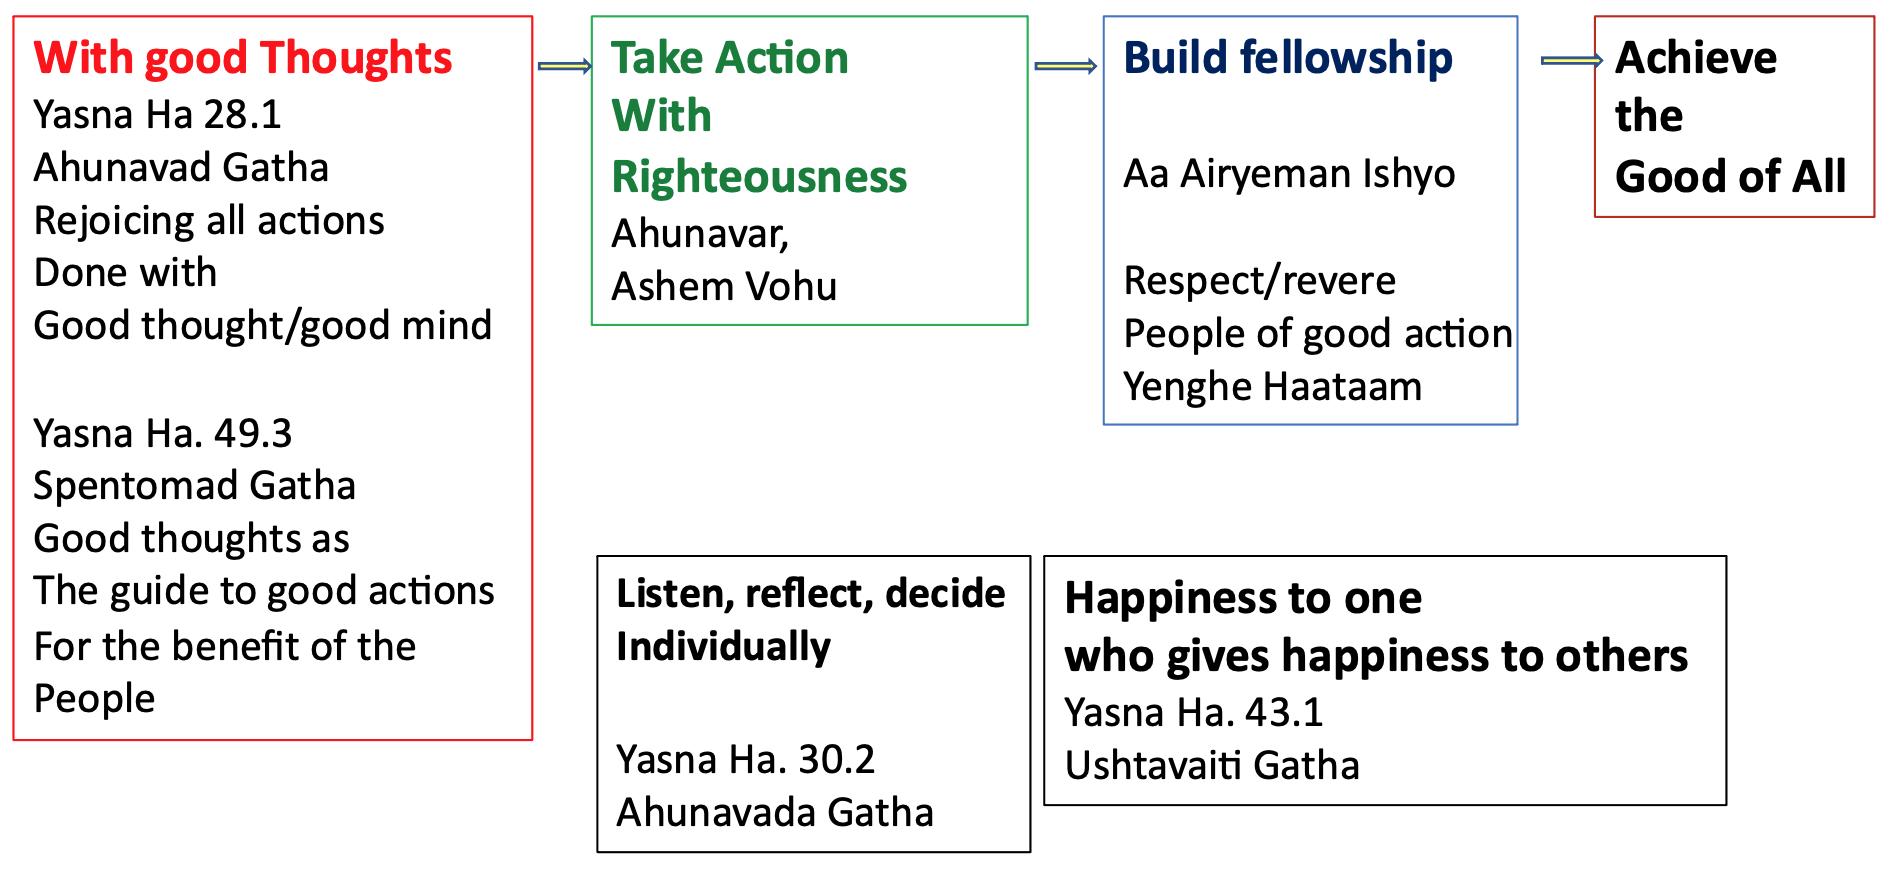 Ba Humata - Philosophy in the Gathas